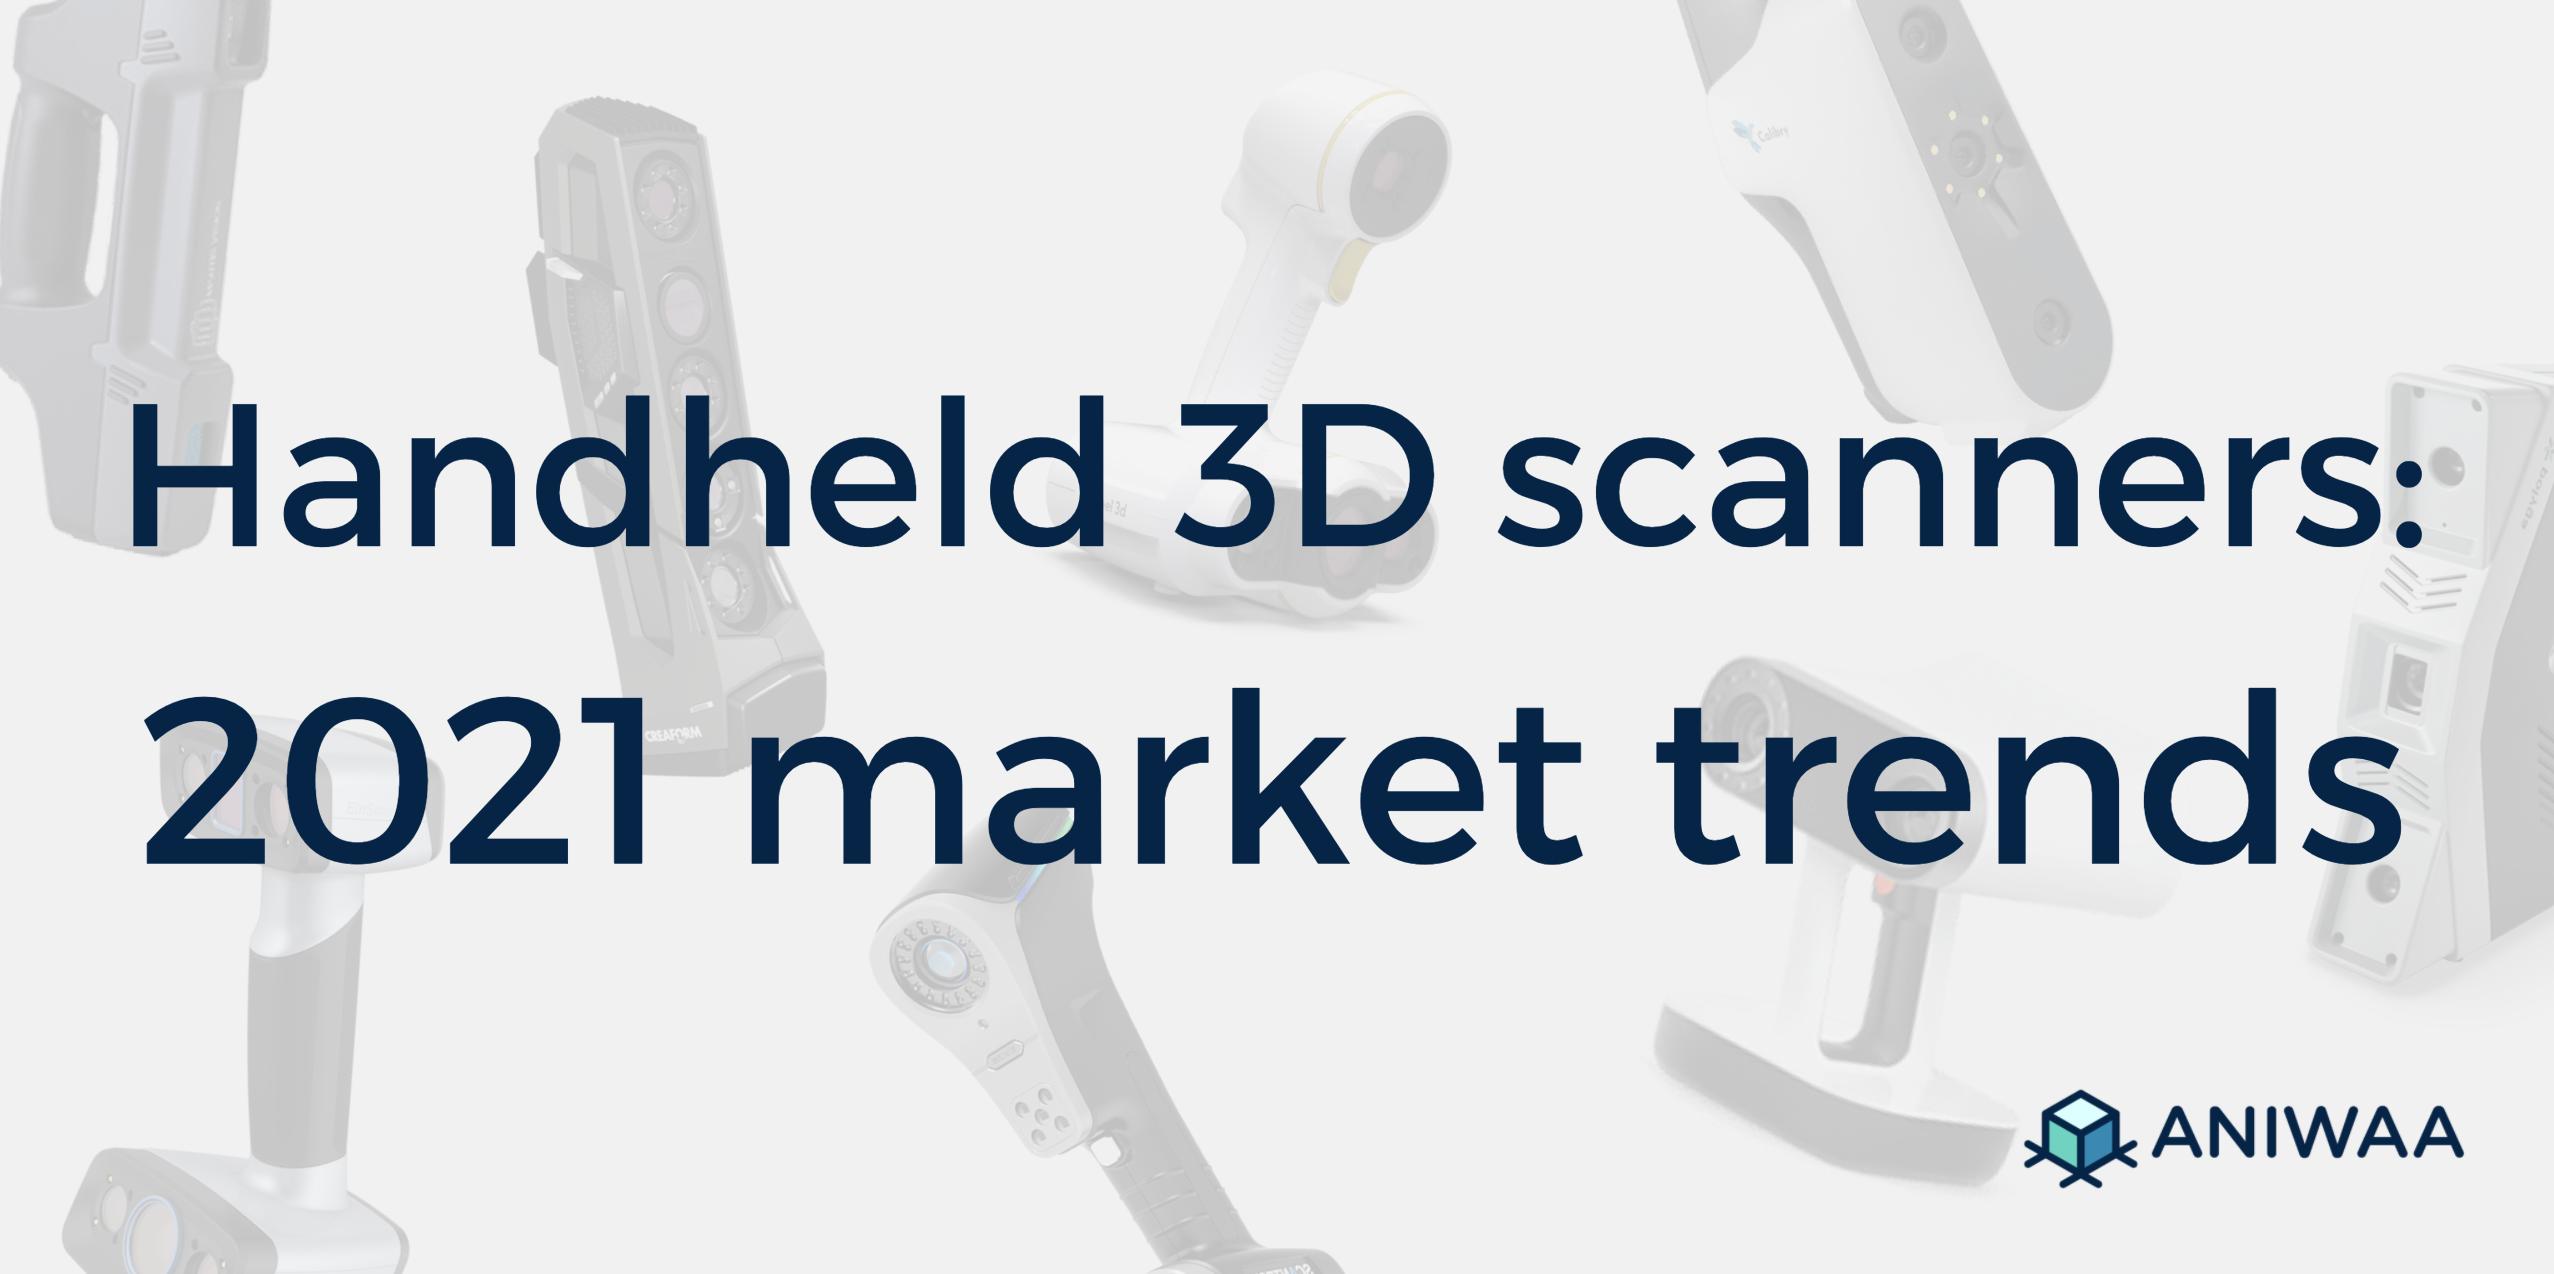 Handheld 3D scanner market trends and key takeaways